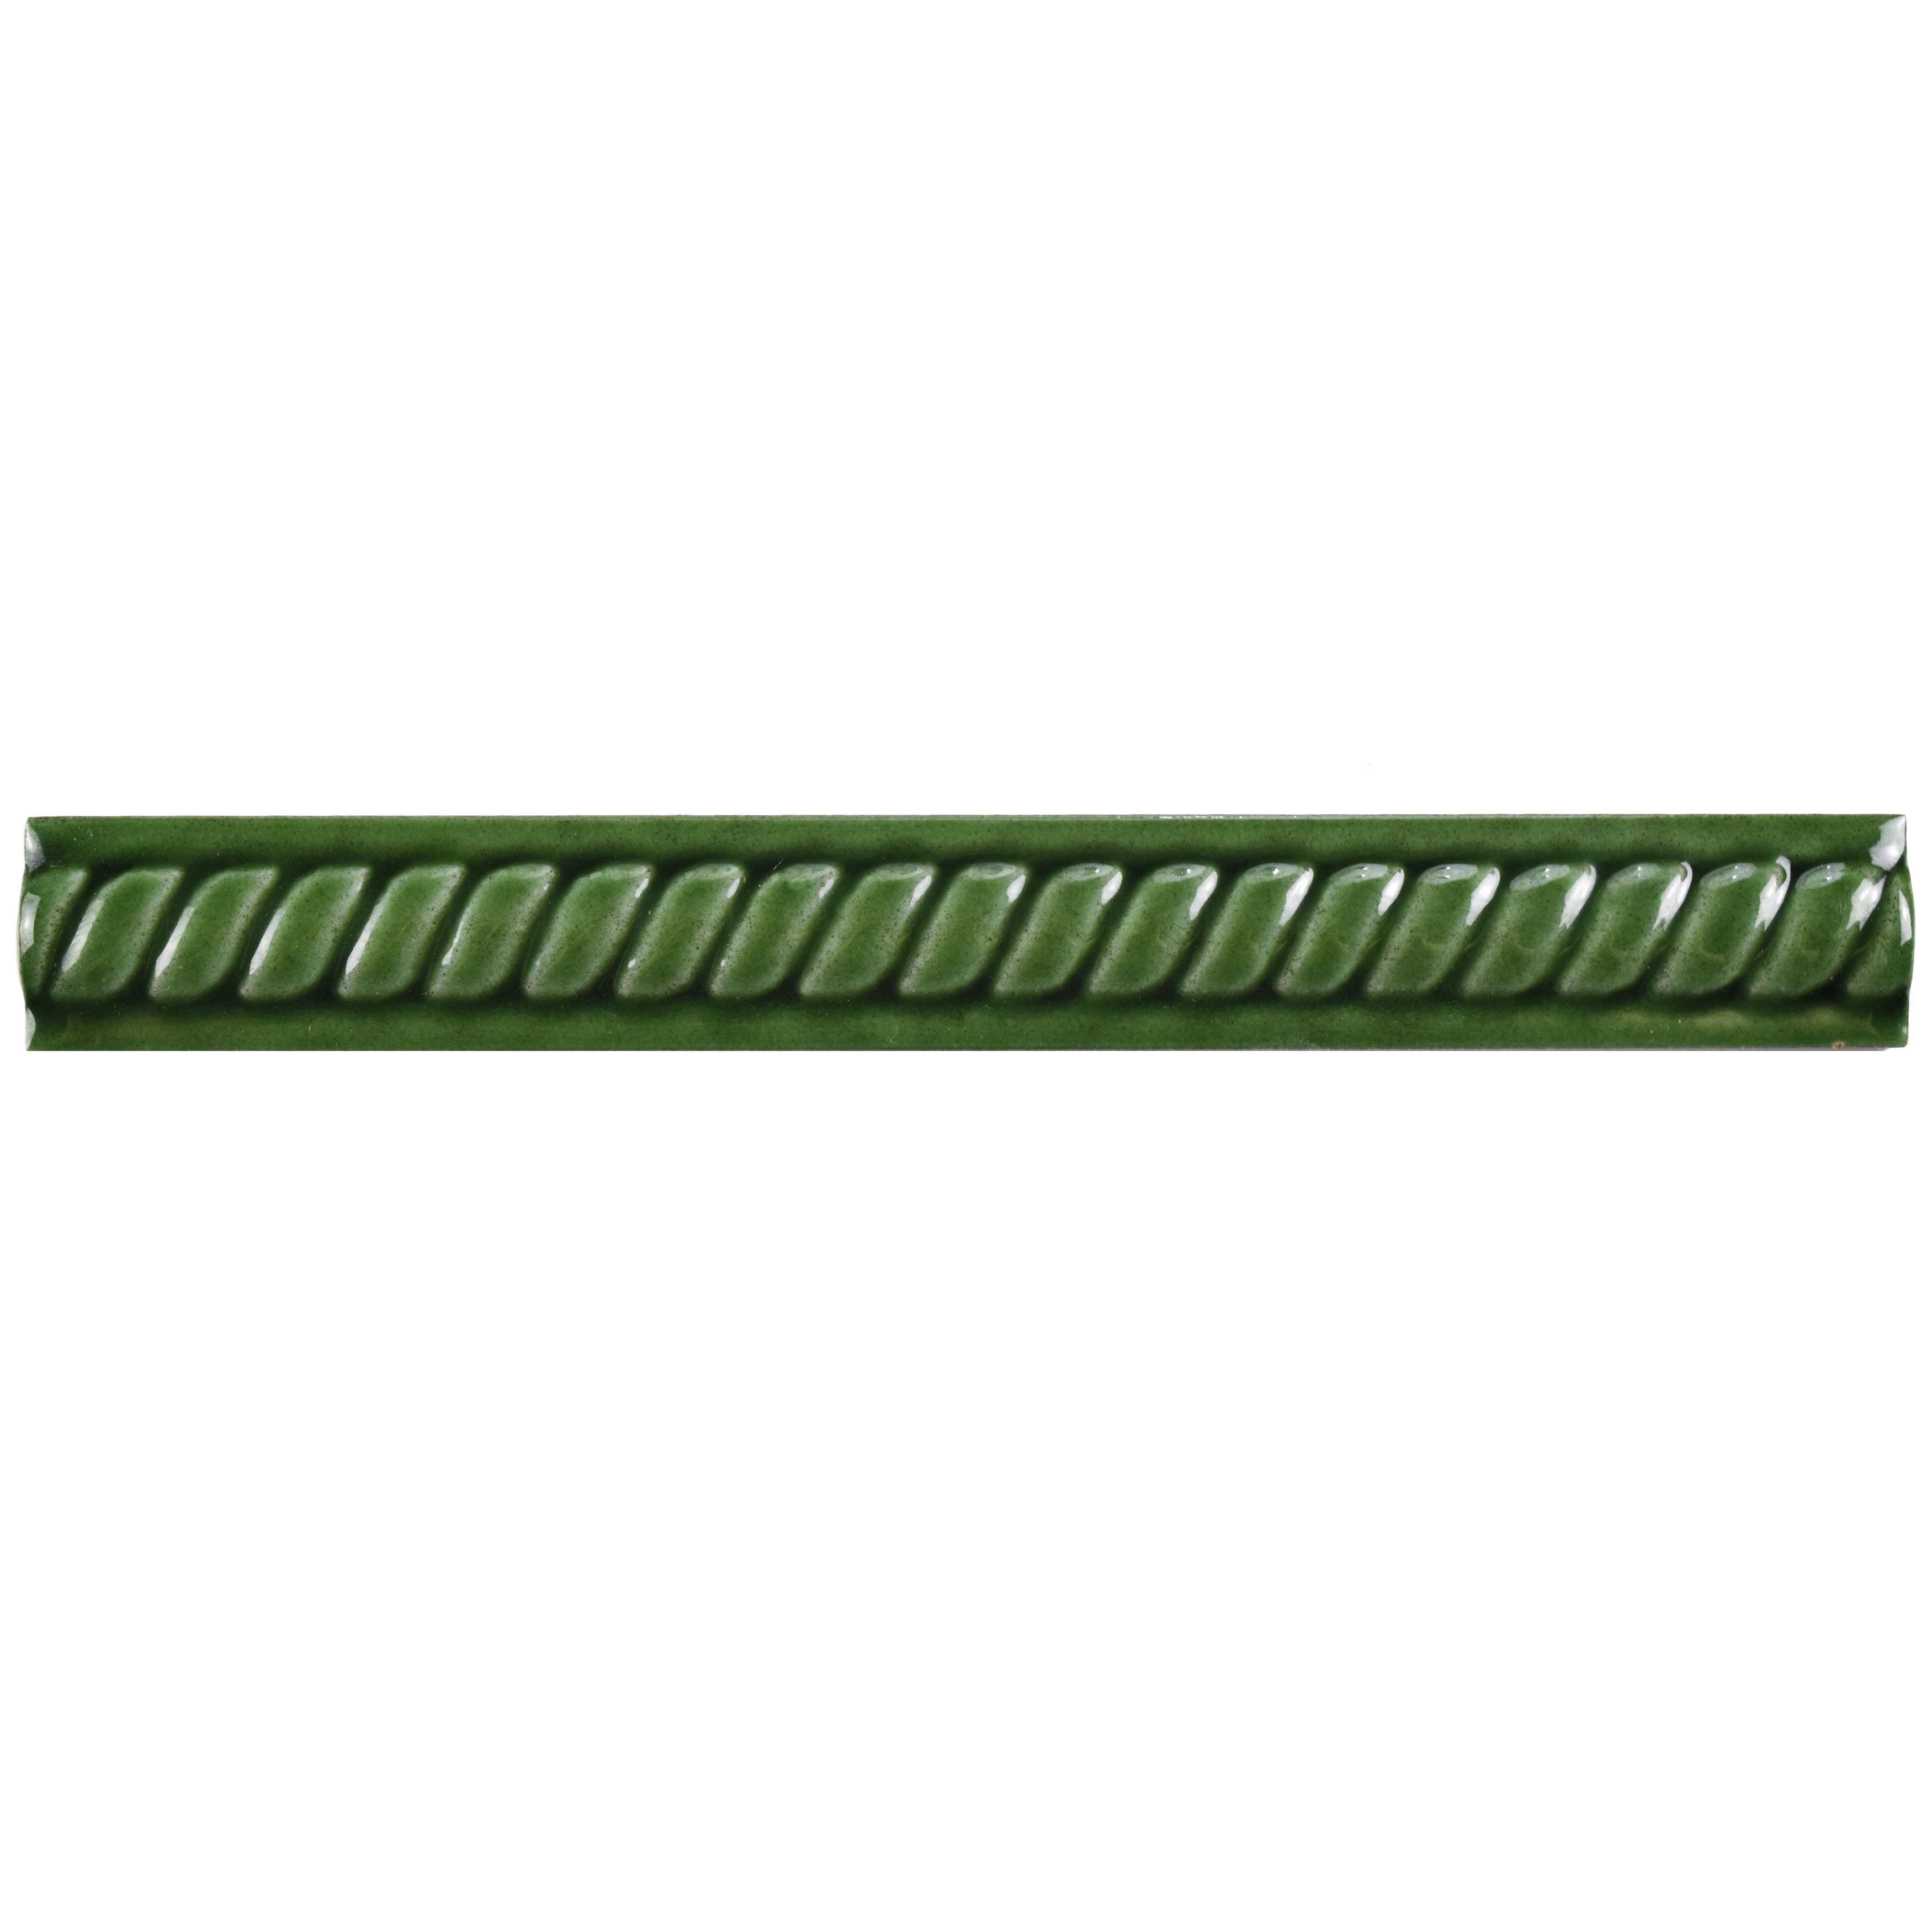 Somertile 1x7 875 Inch Trenzas Verde Moldura Pencil